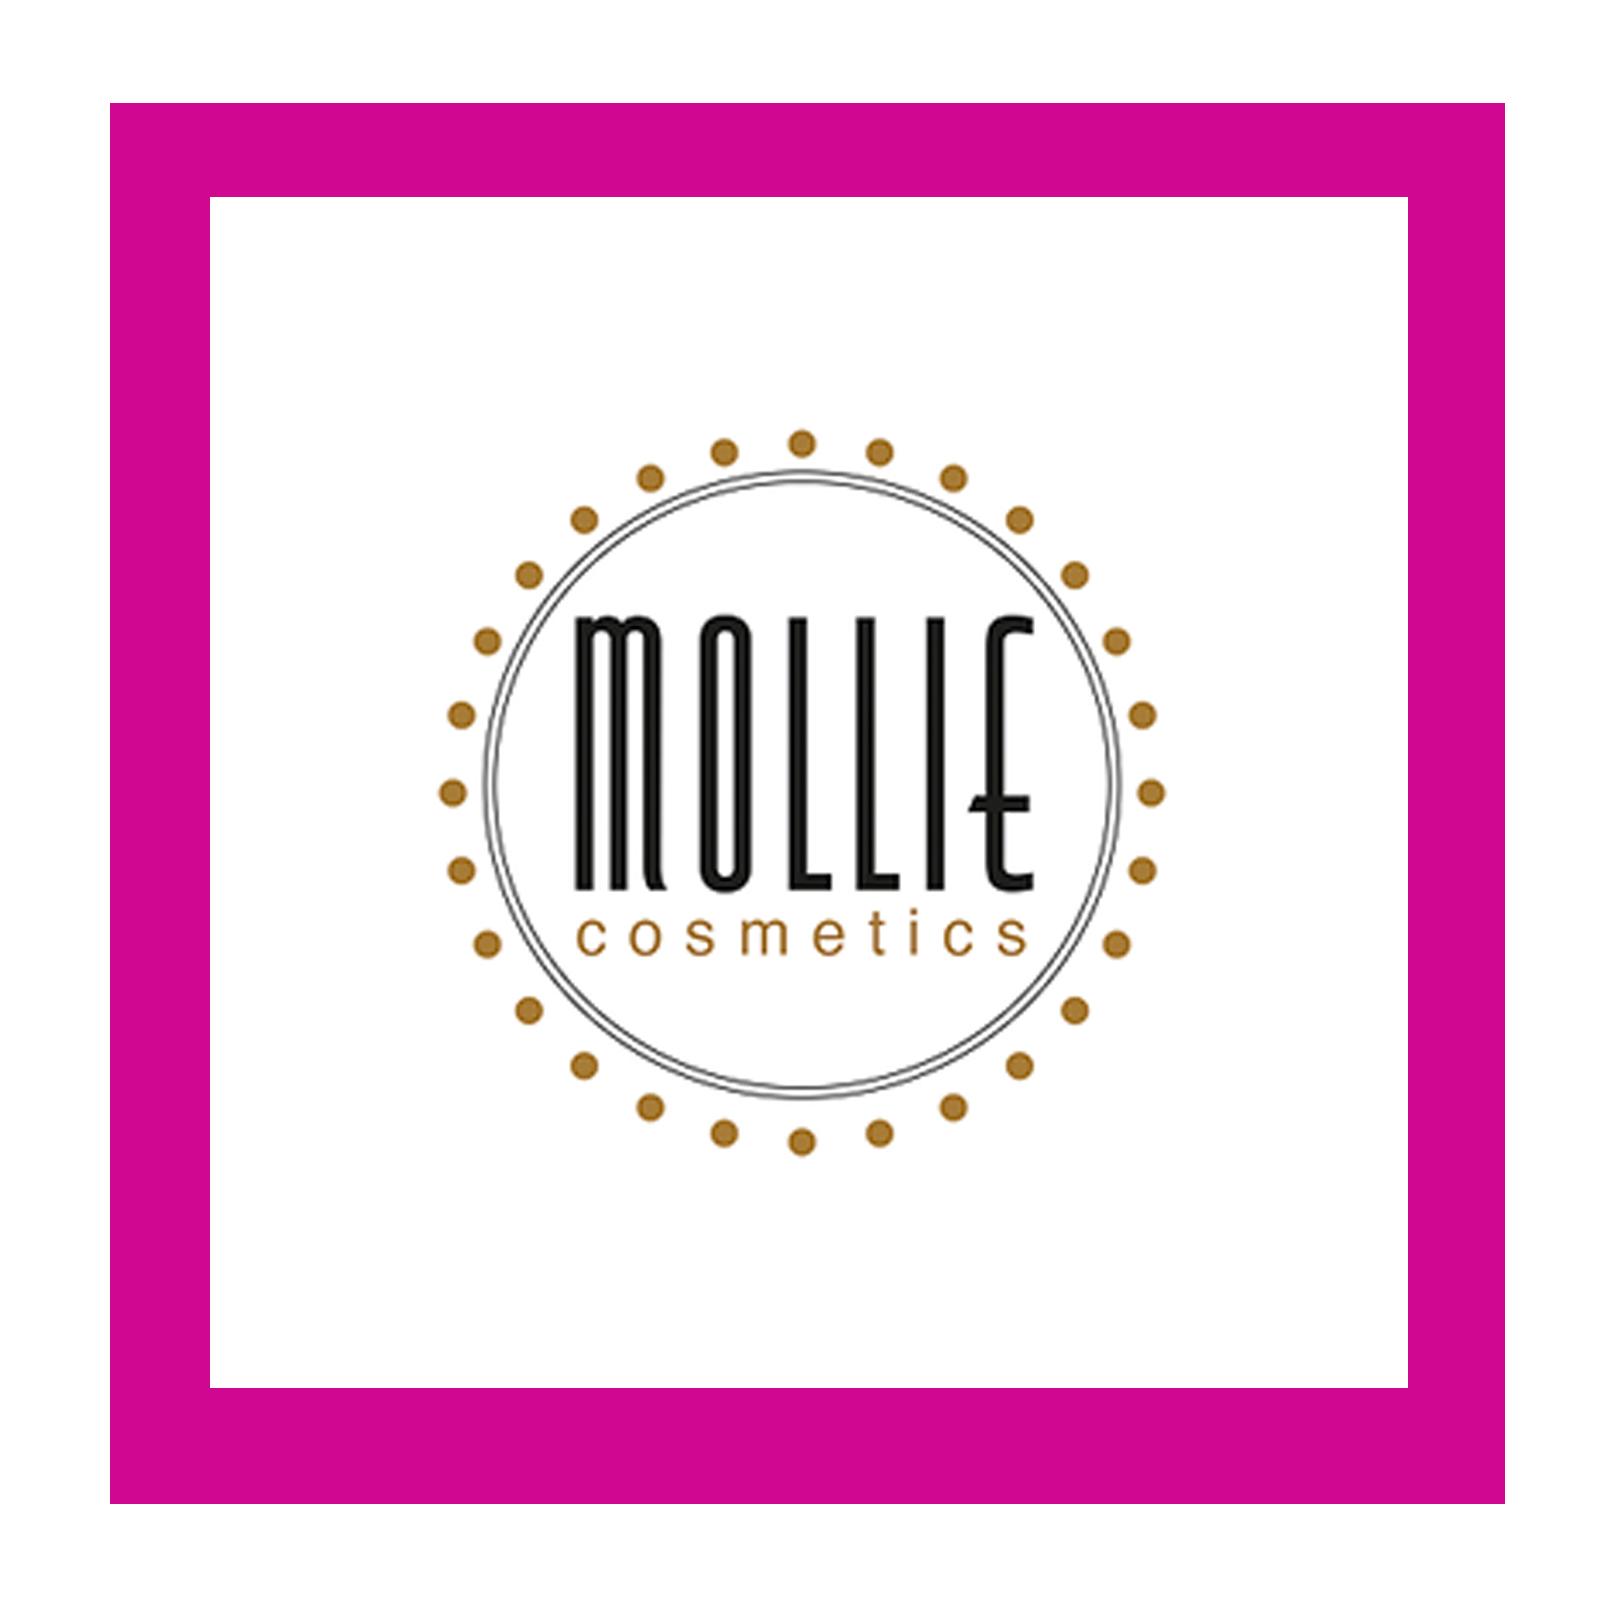 Mollie 2.jpg